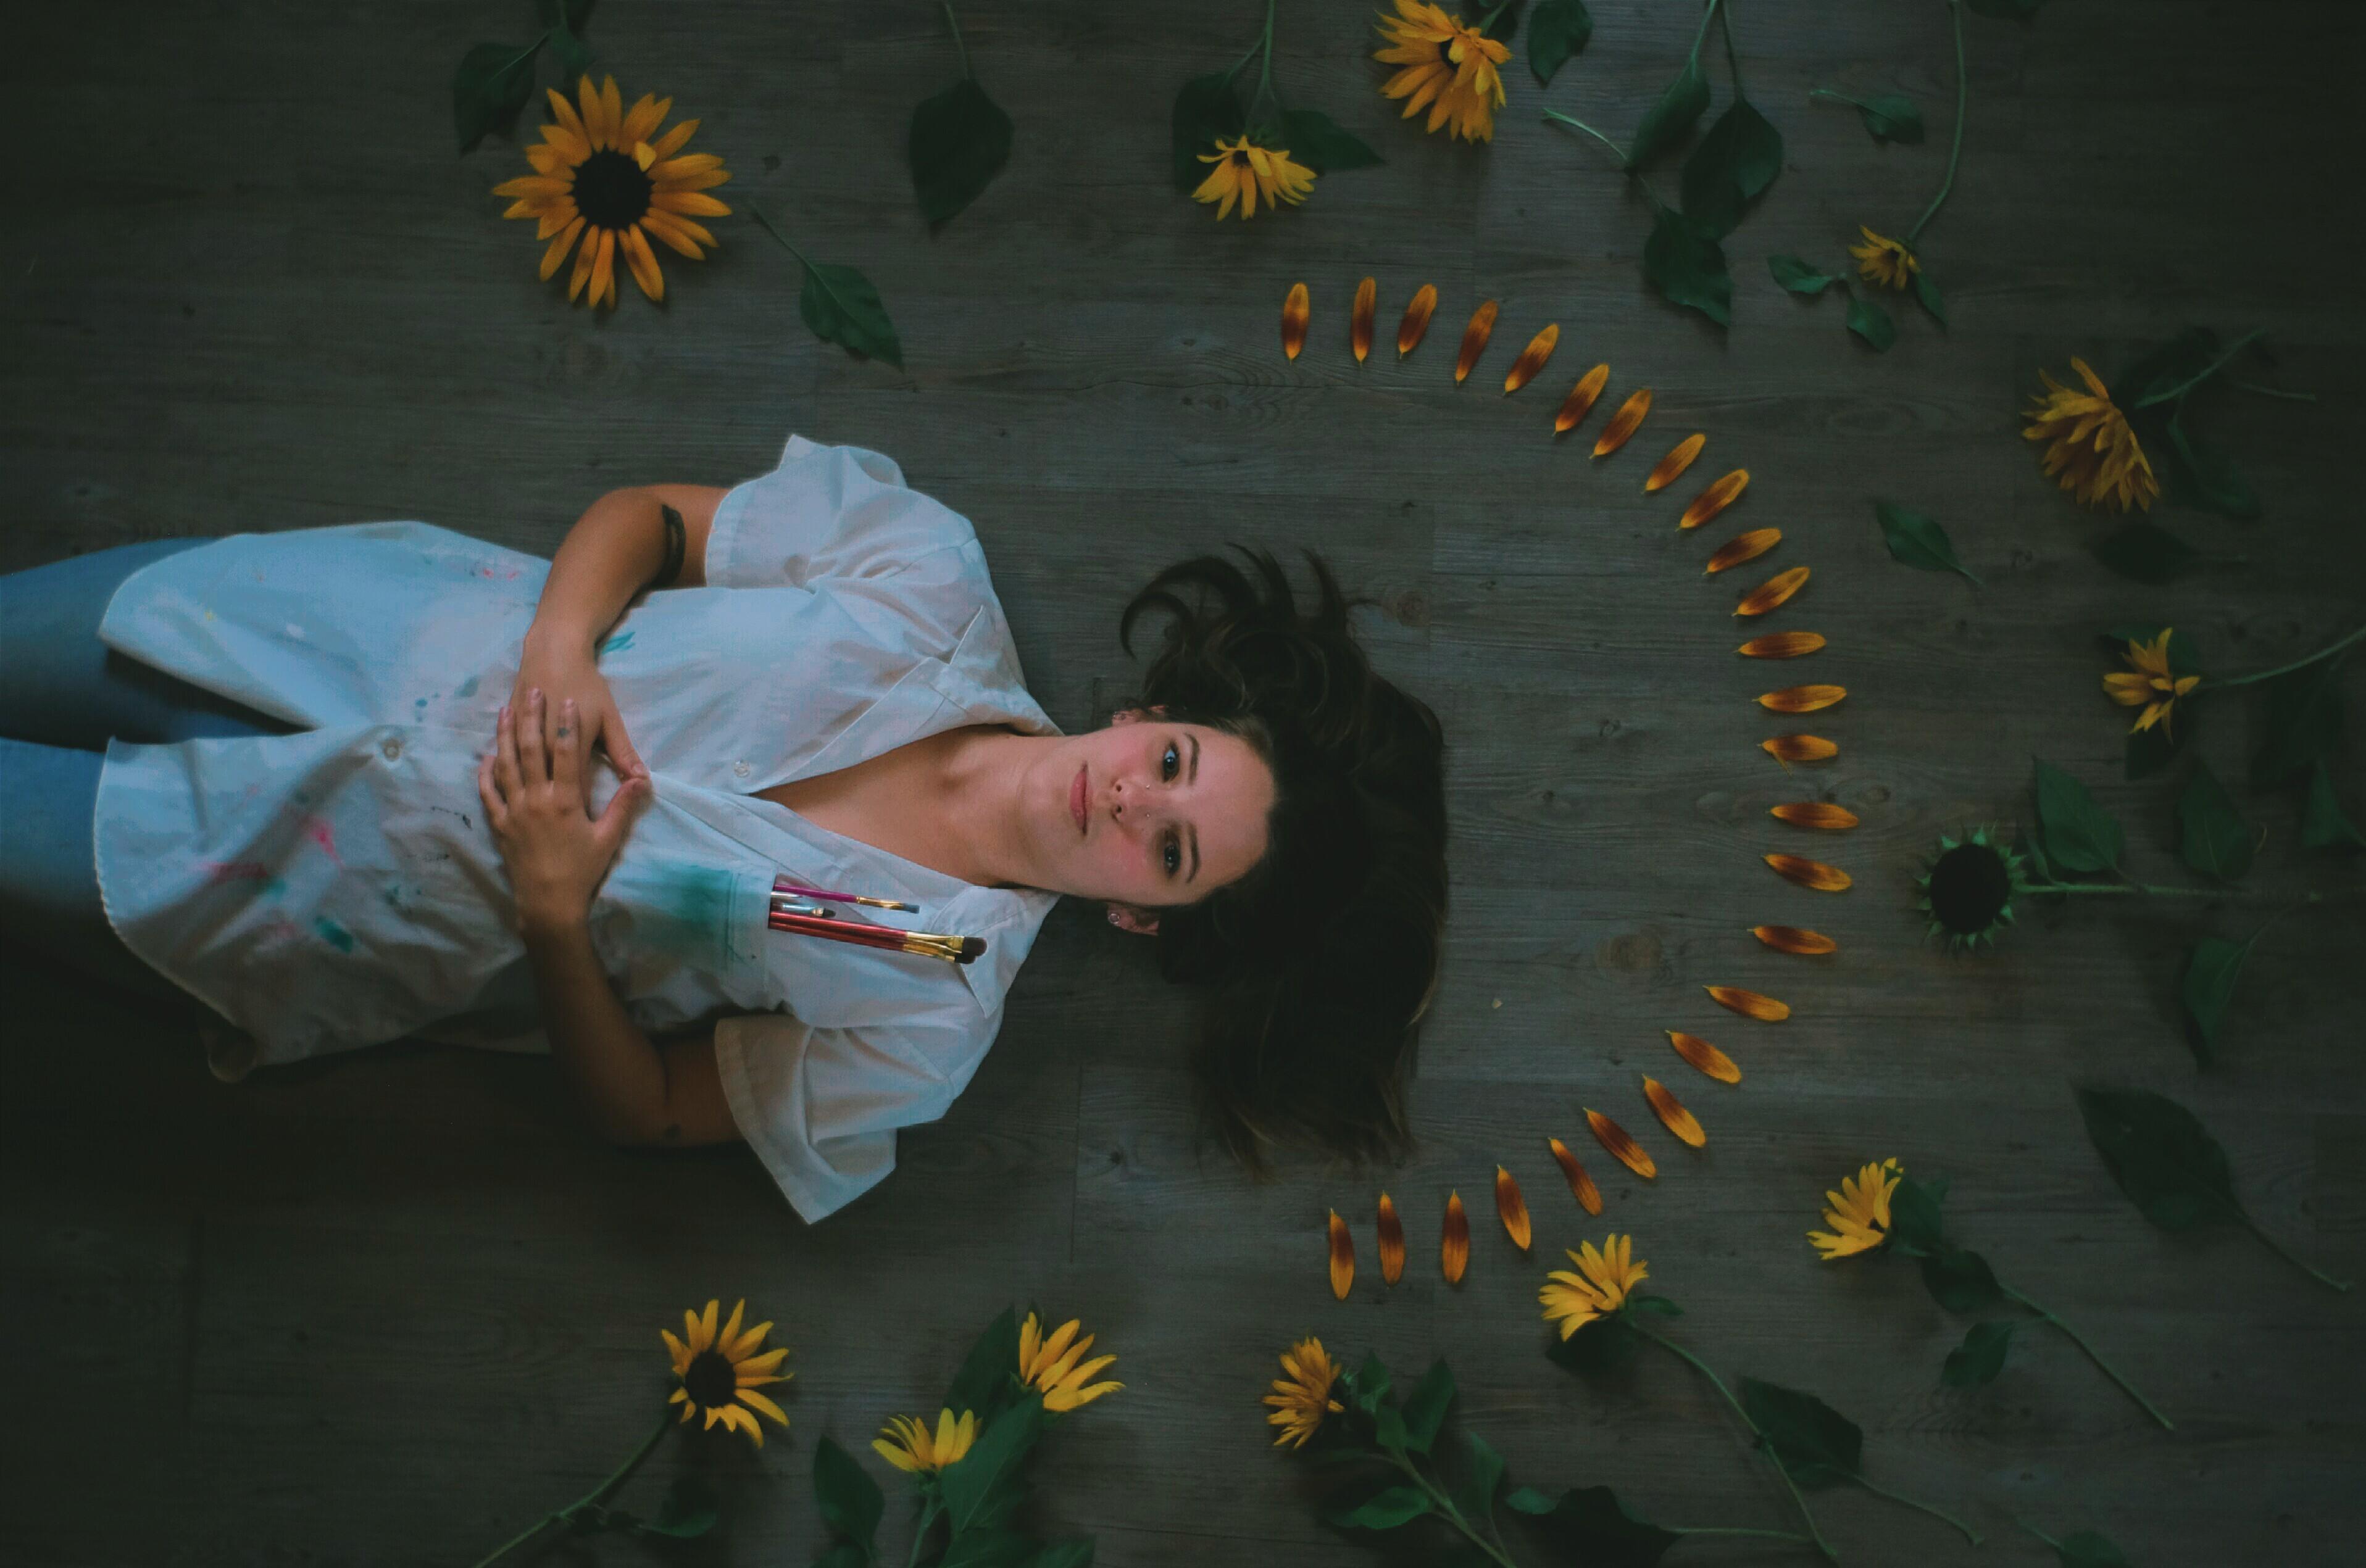 laina mcphee, flowers, sunflowers, birds eye view, portrait, Lindsey tyne johnson